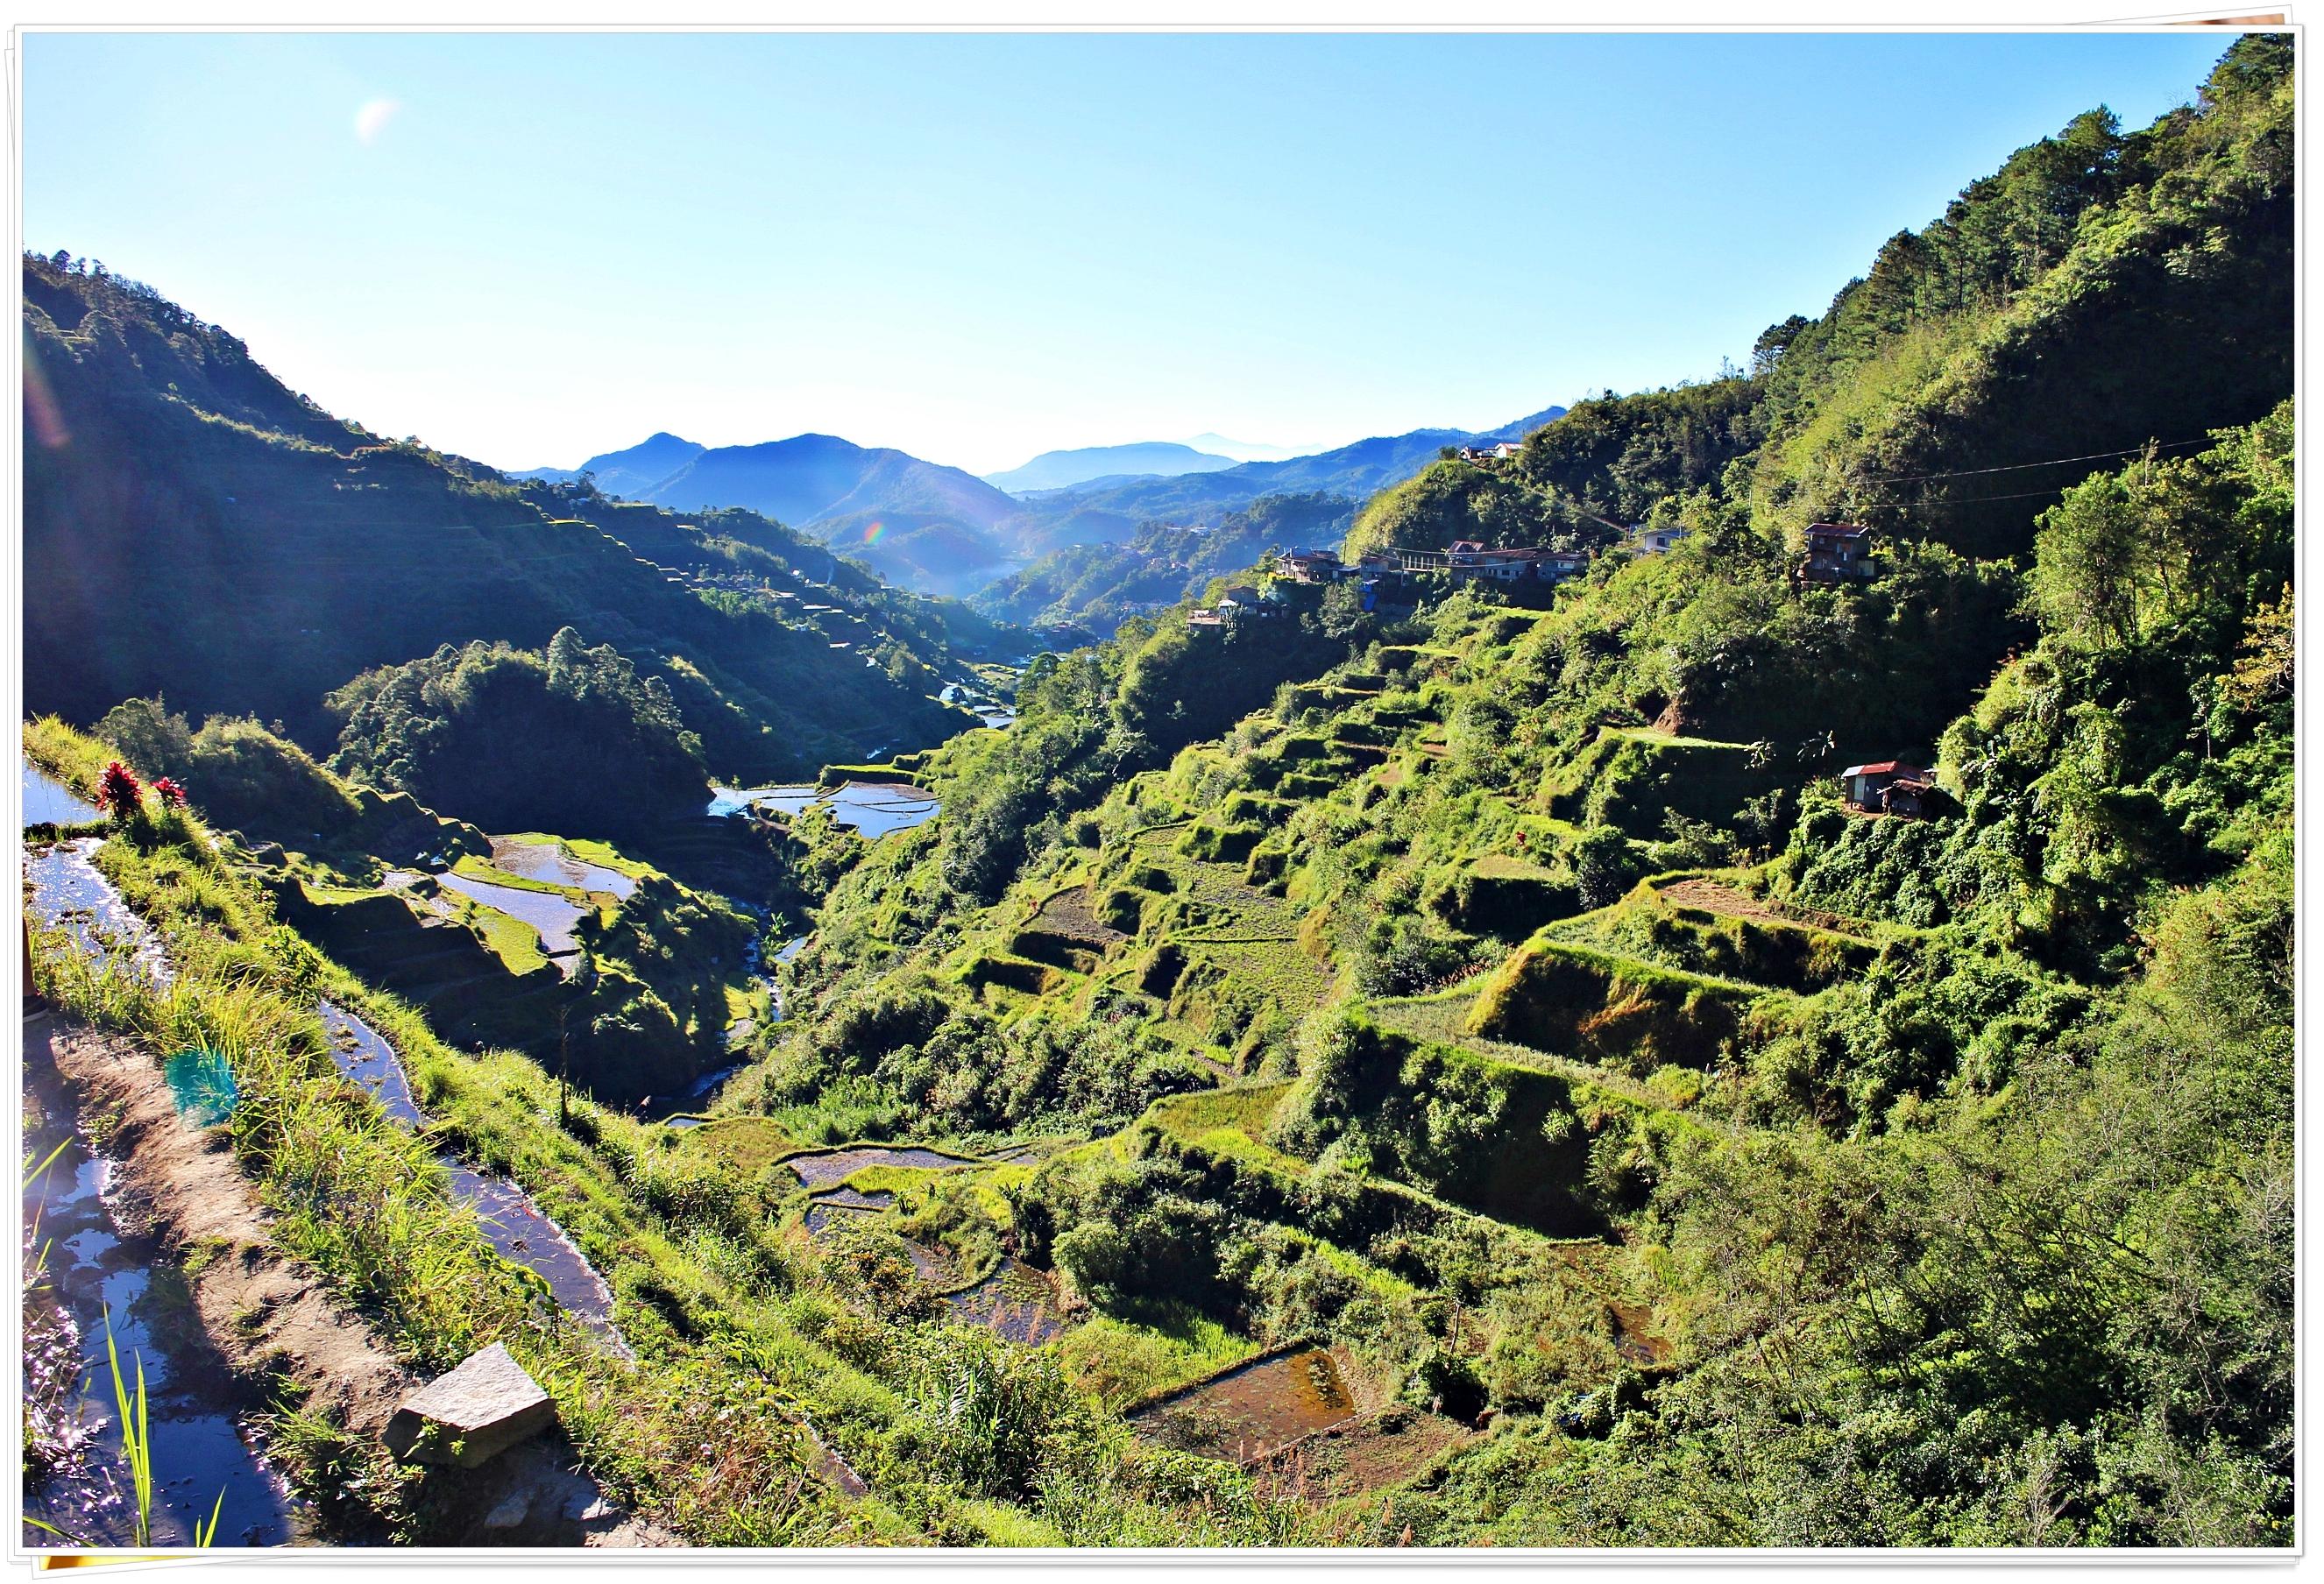 02_2015 PhilTrip - Banaue Rice Terraces